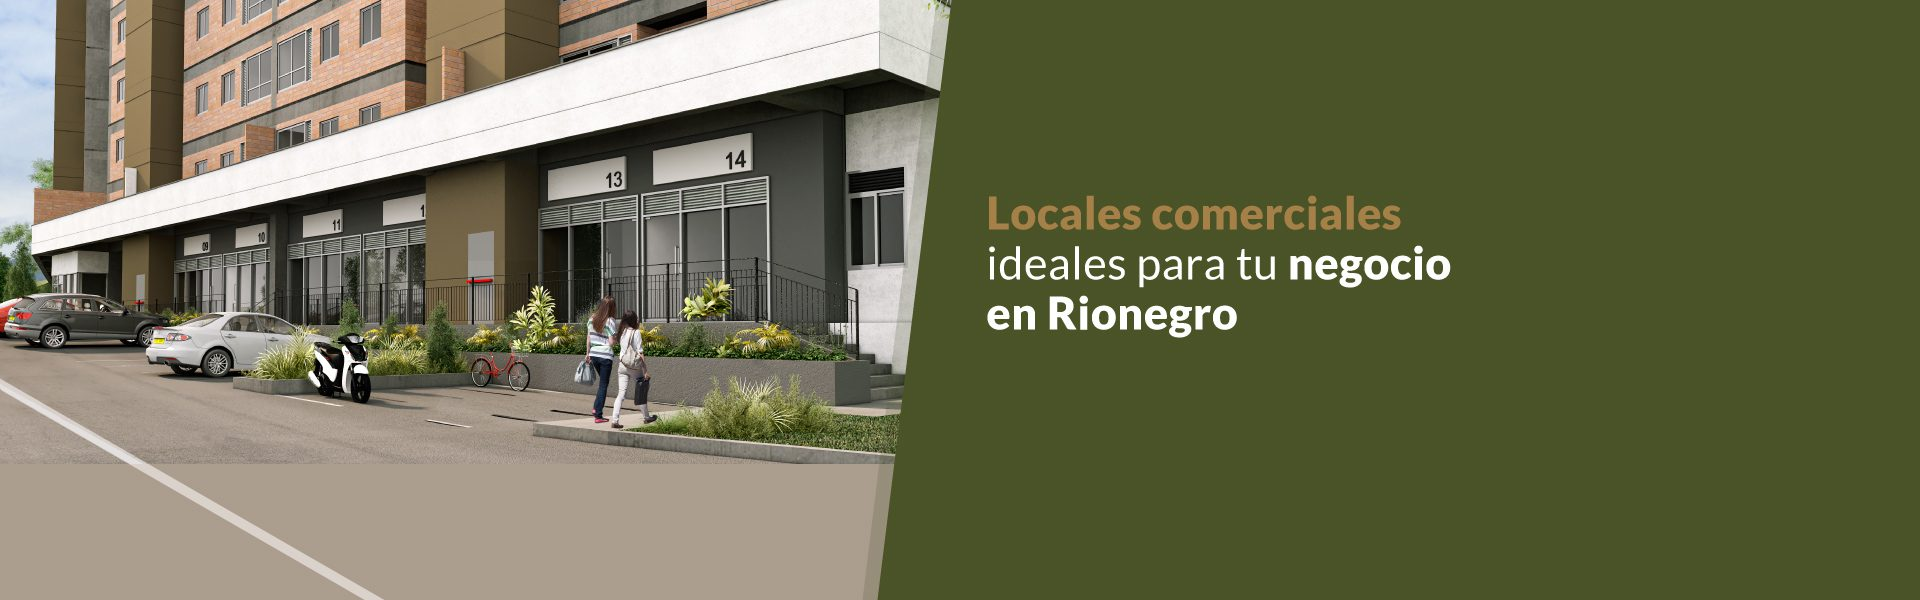 Pinares-Mall-Comerciales-1920